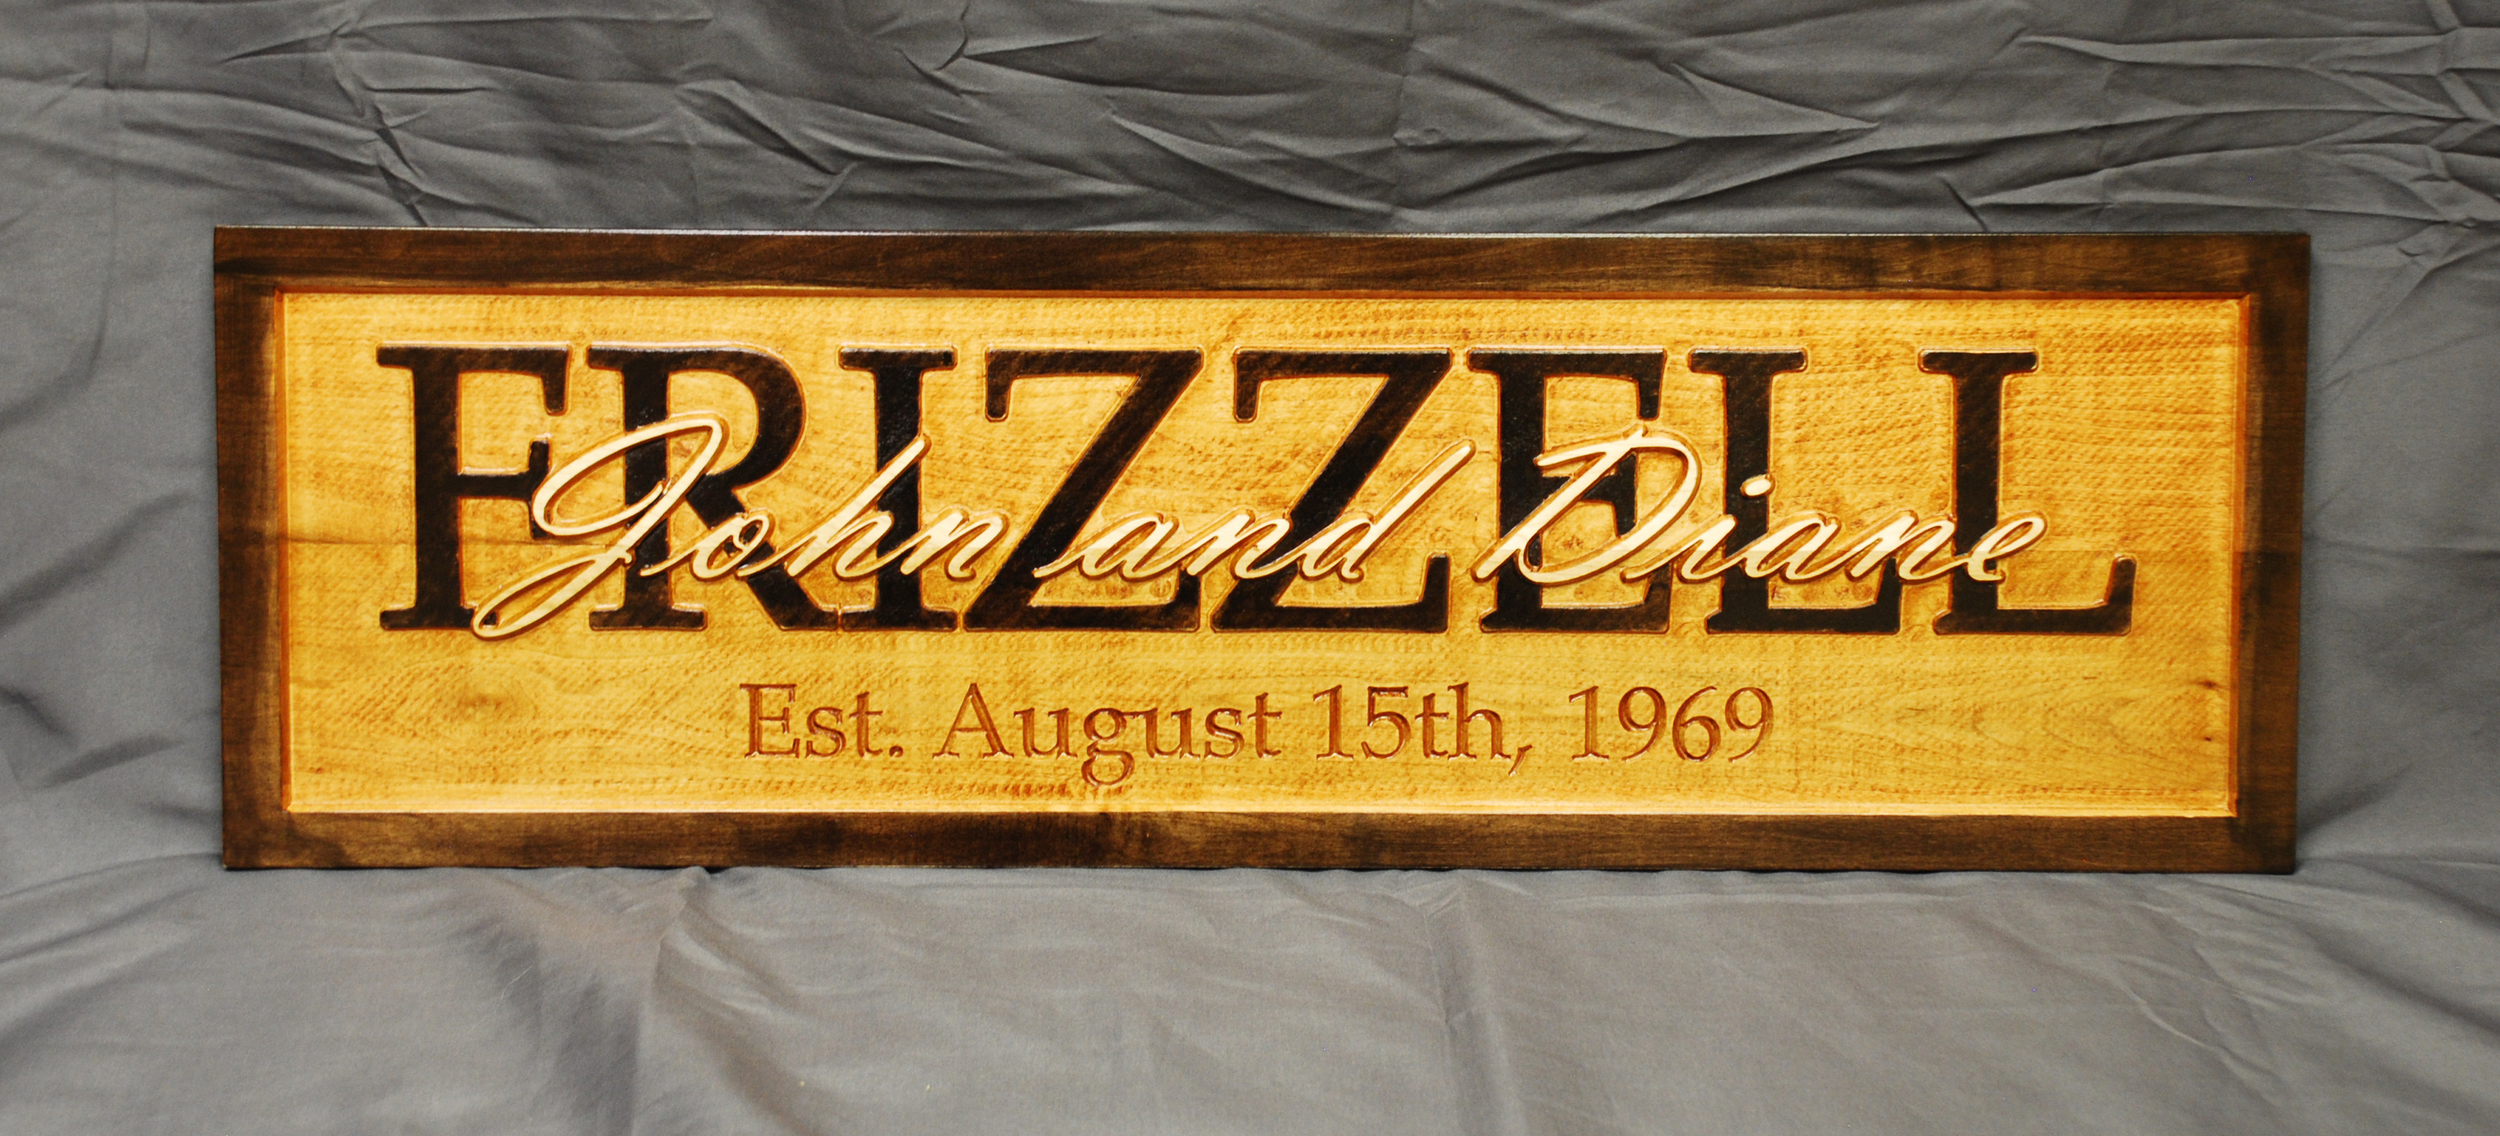 Frizzell JD.jpg